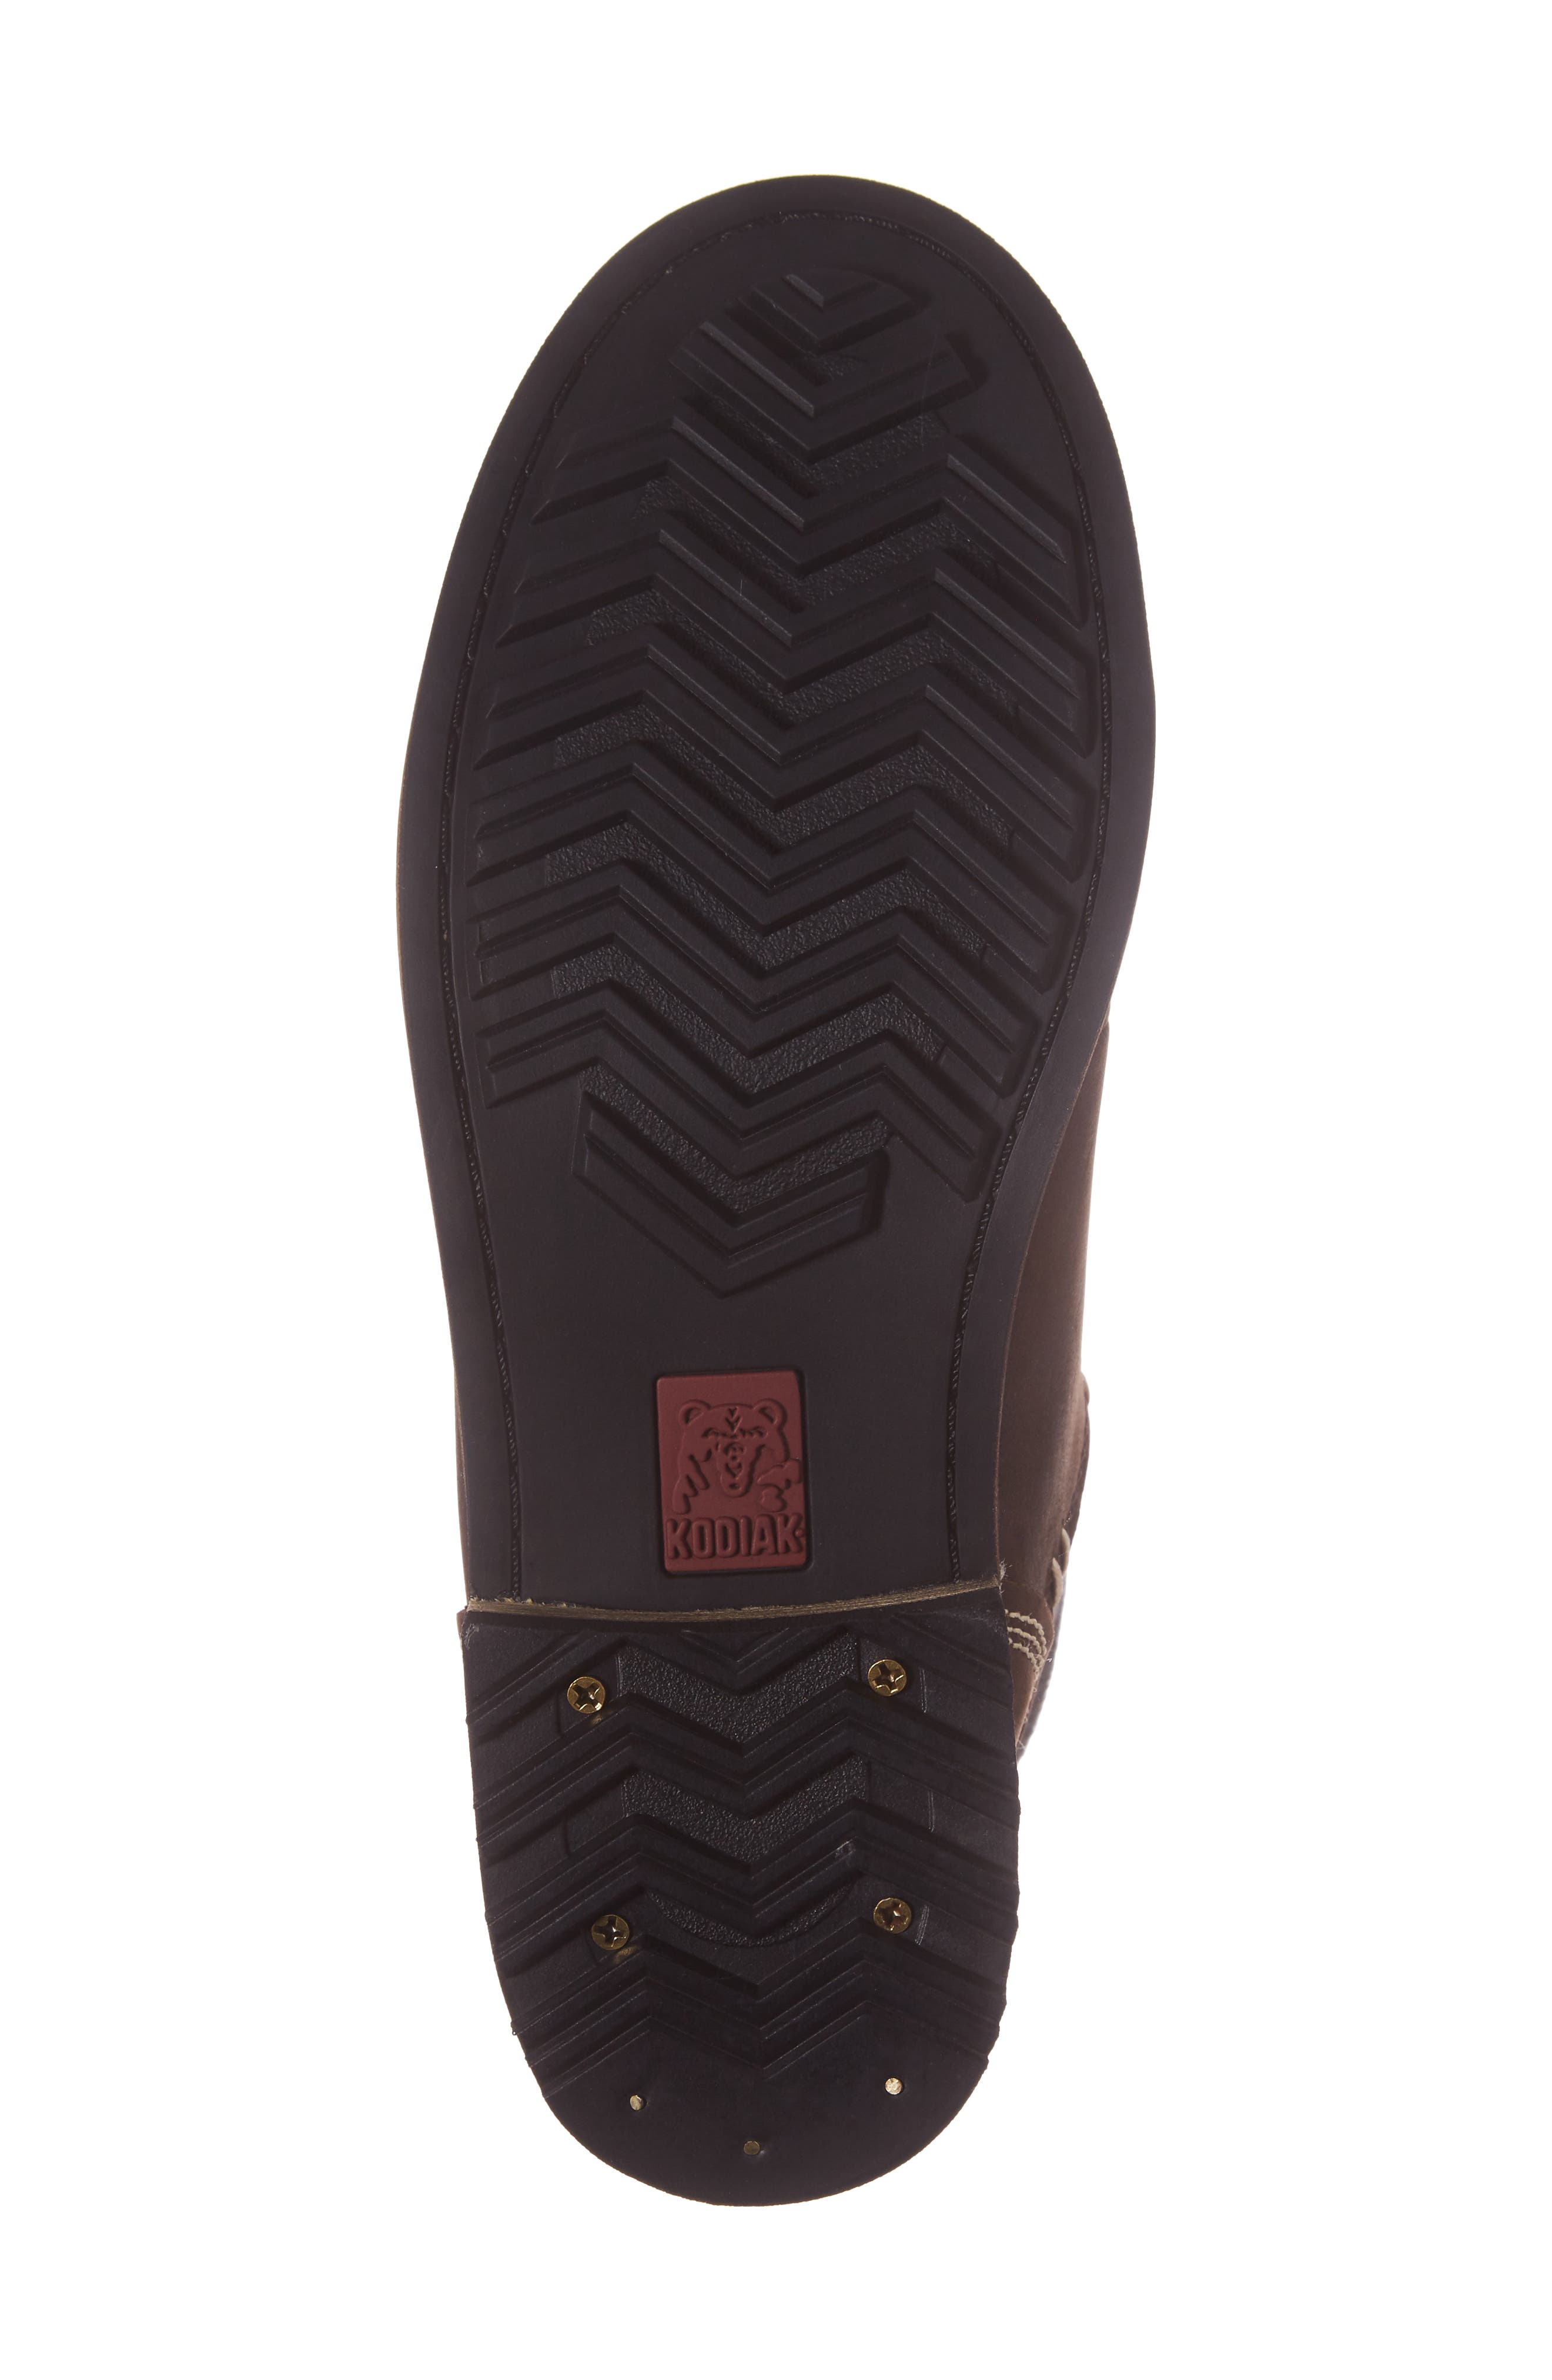 Surrey II Waterproof Boot,                             Alternate thumbnail 6, color,                             Brown Leather